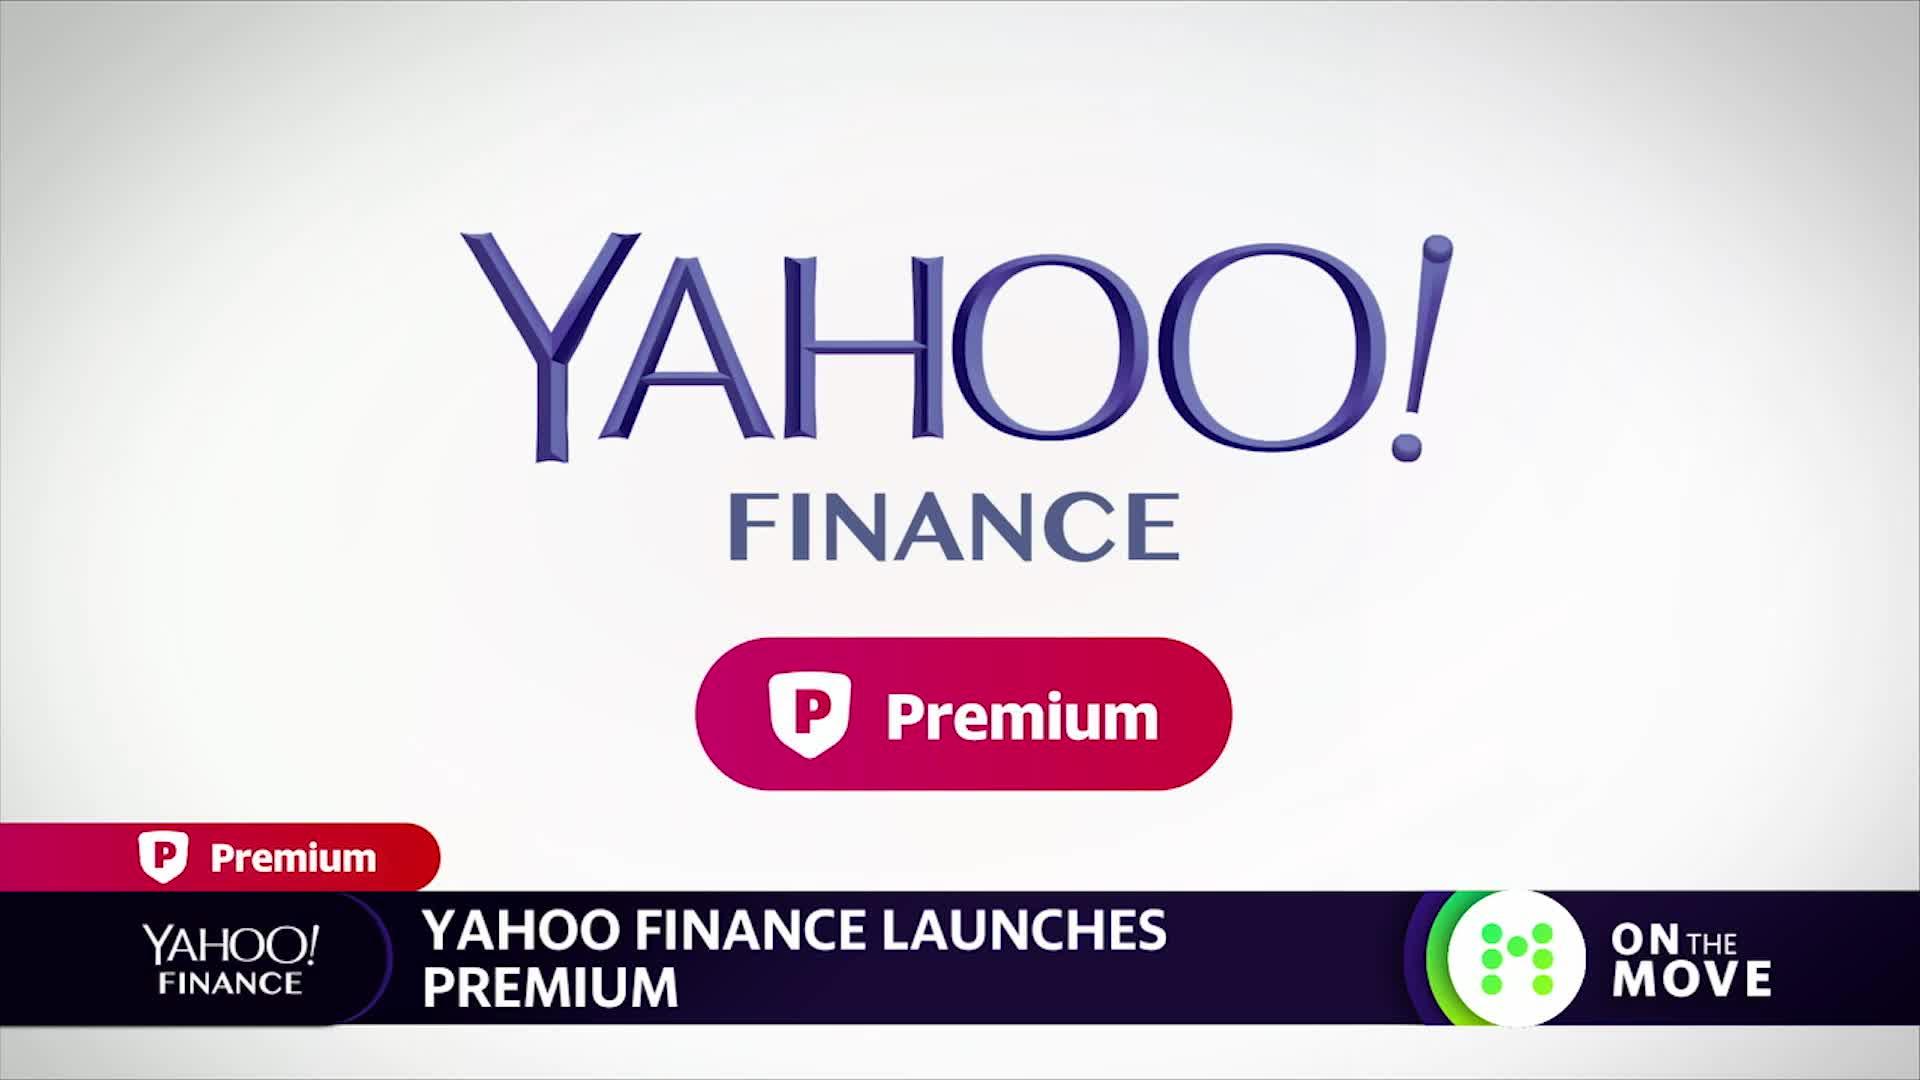 Introducing Yahoo Finance Premium